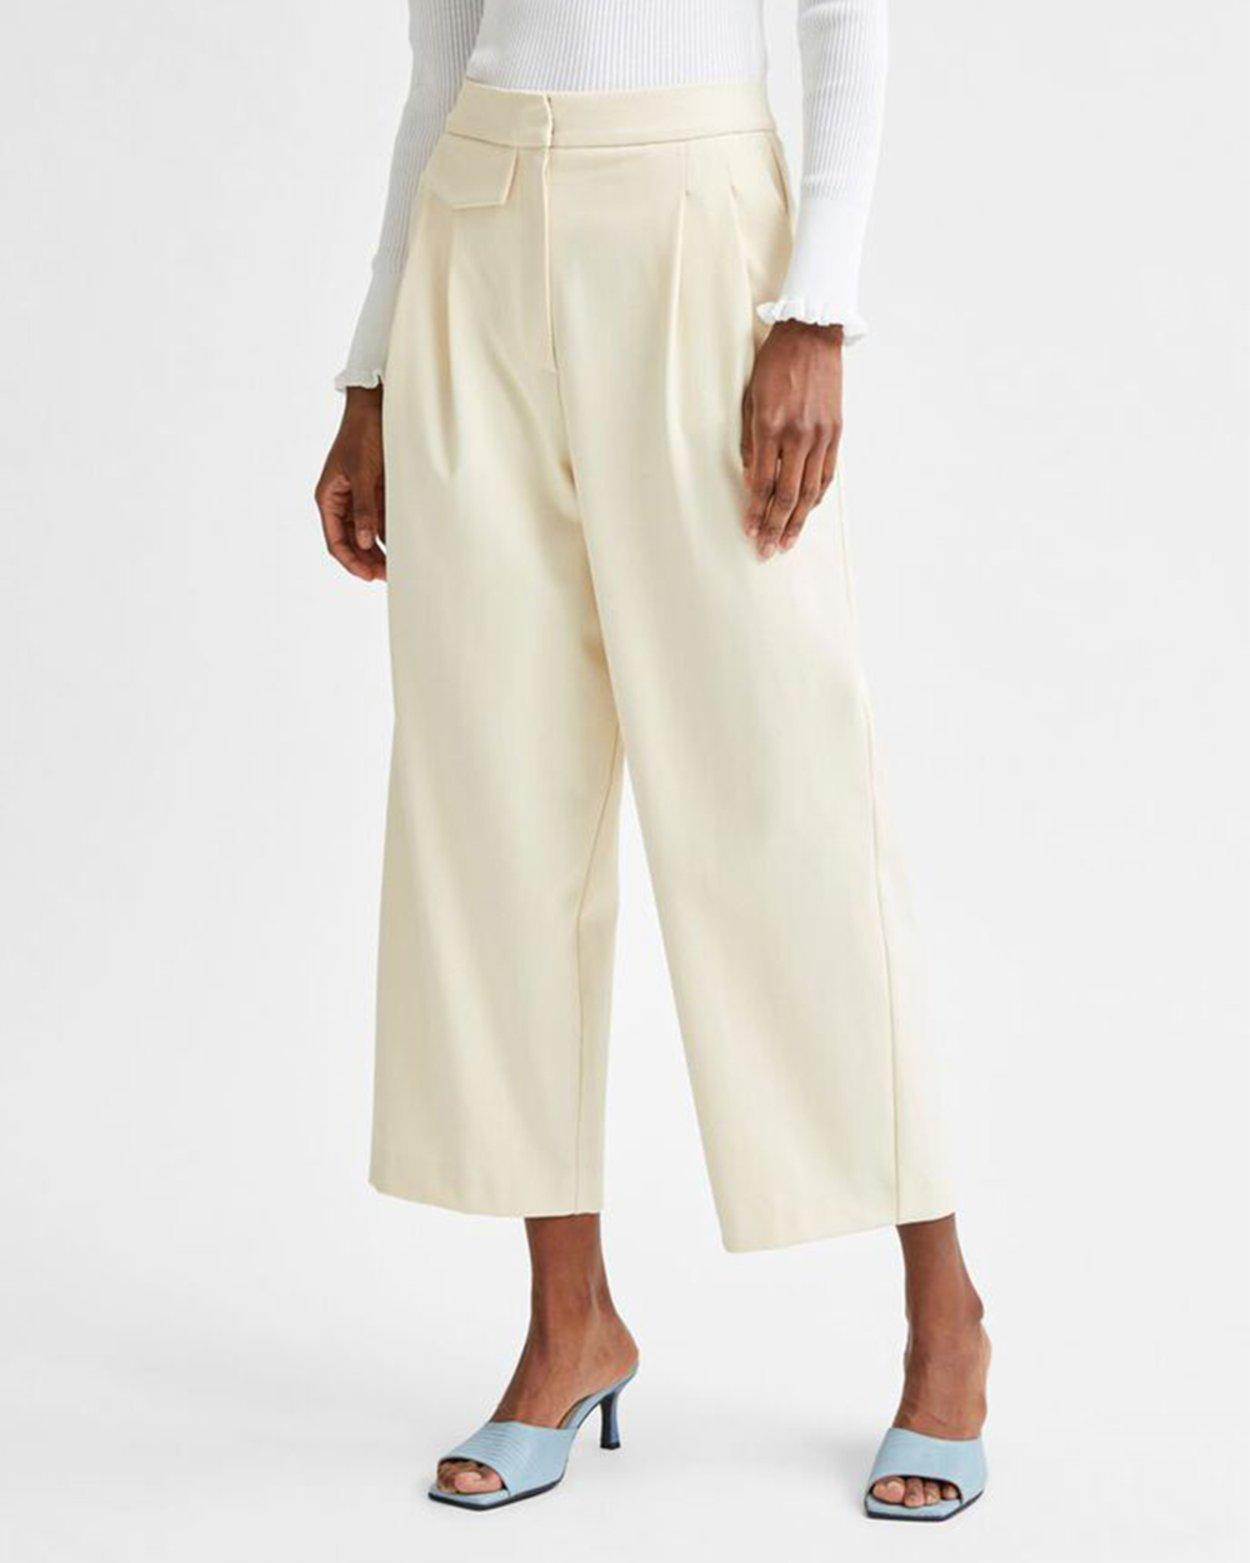 Hyme High Waist Cropped Pant